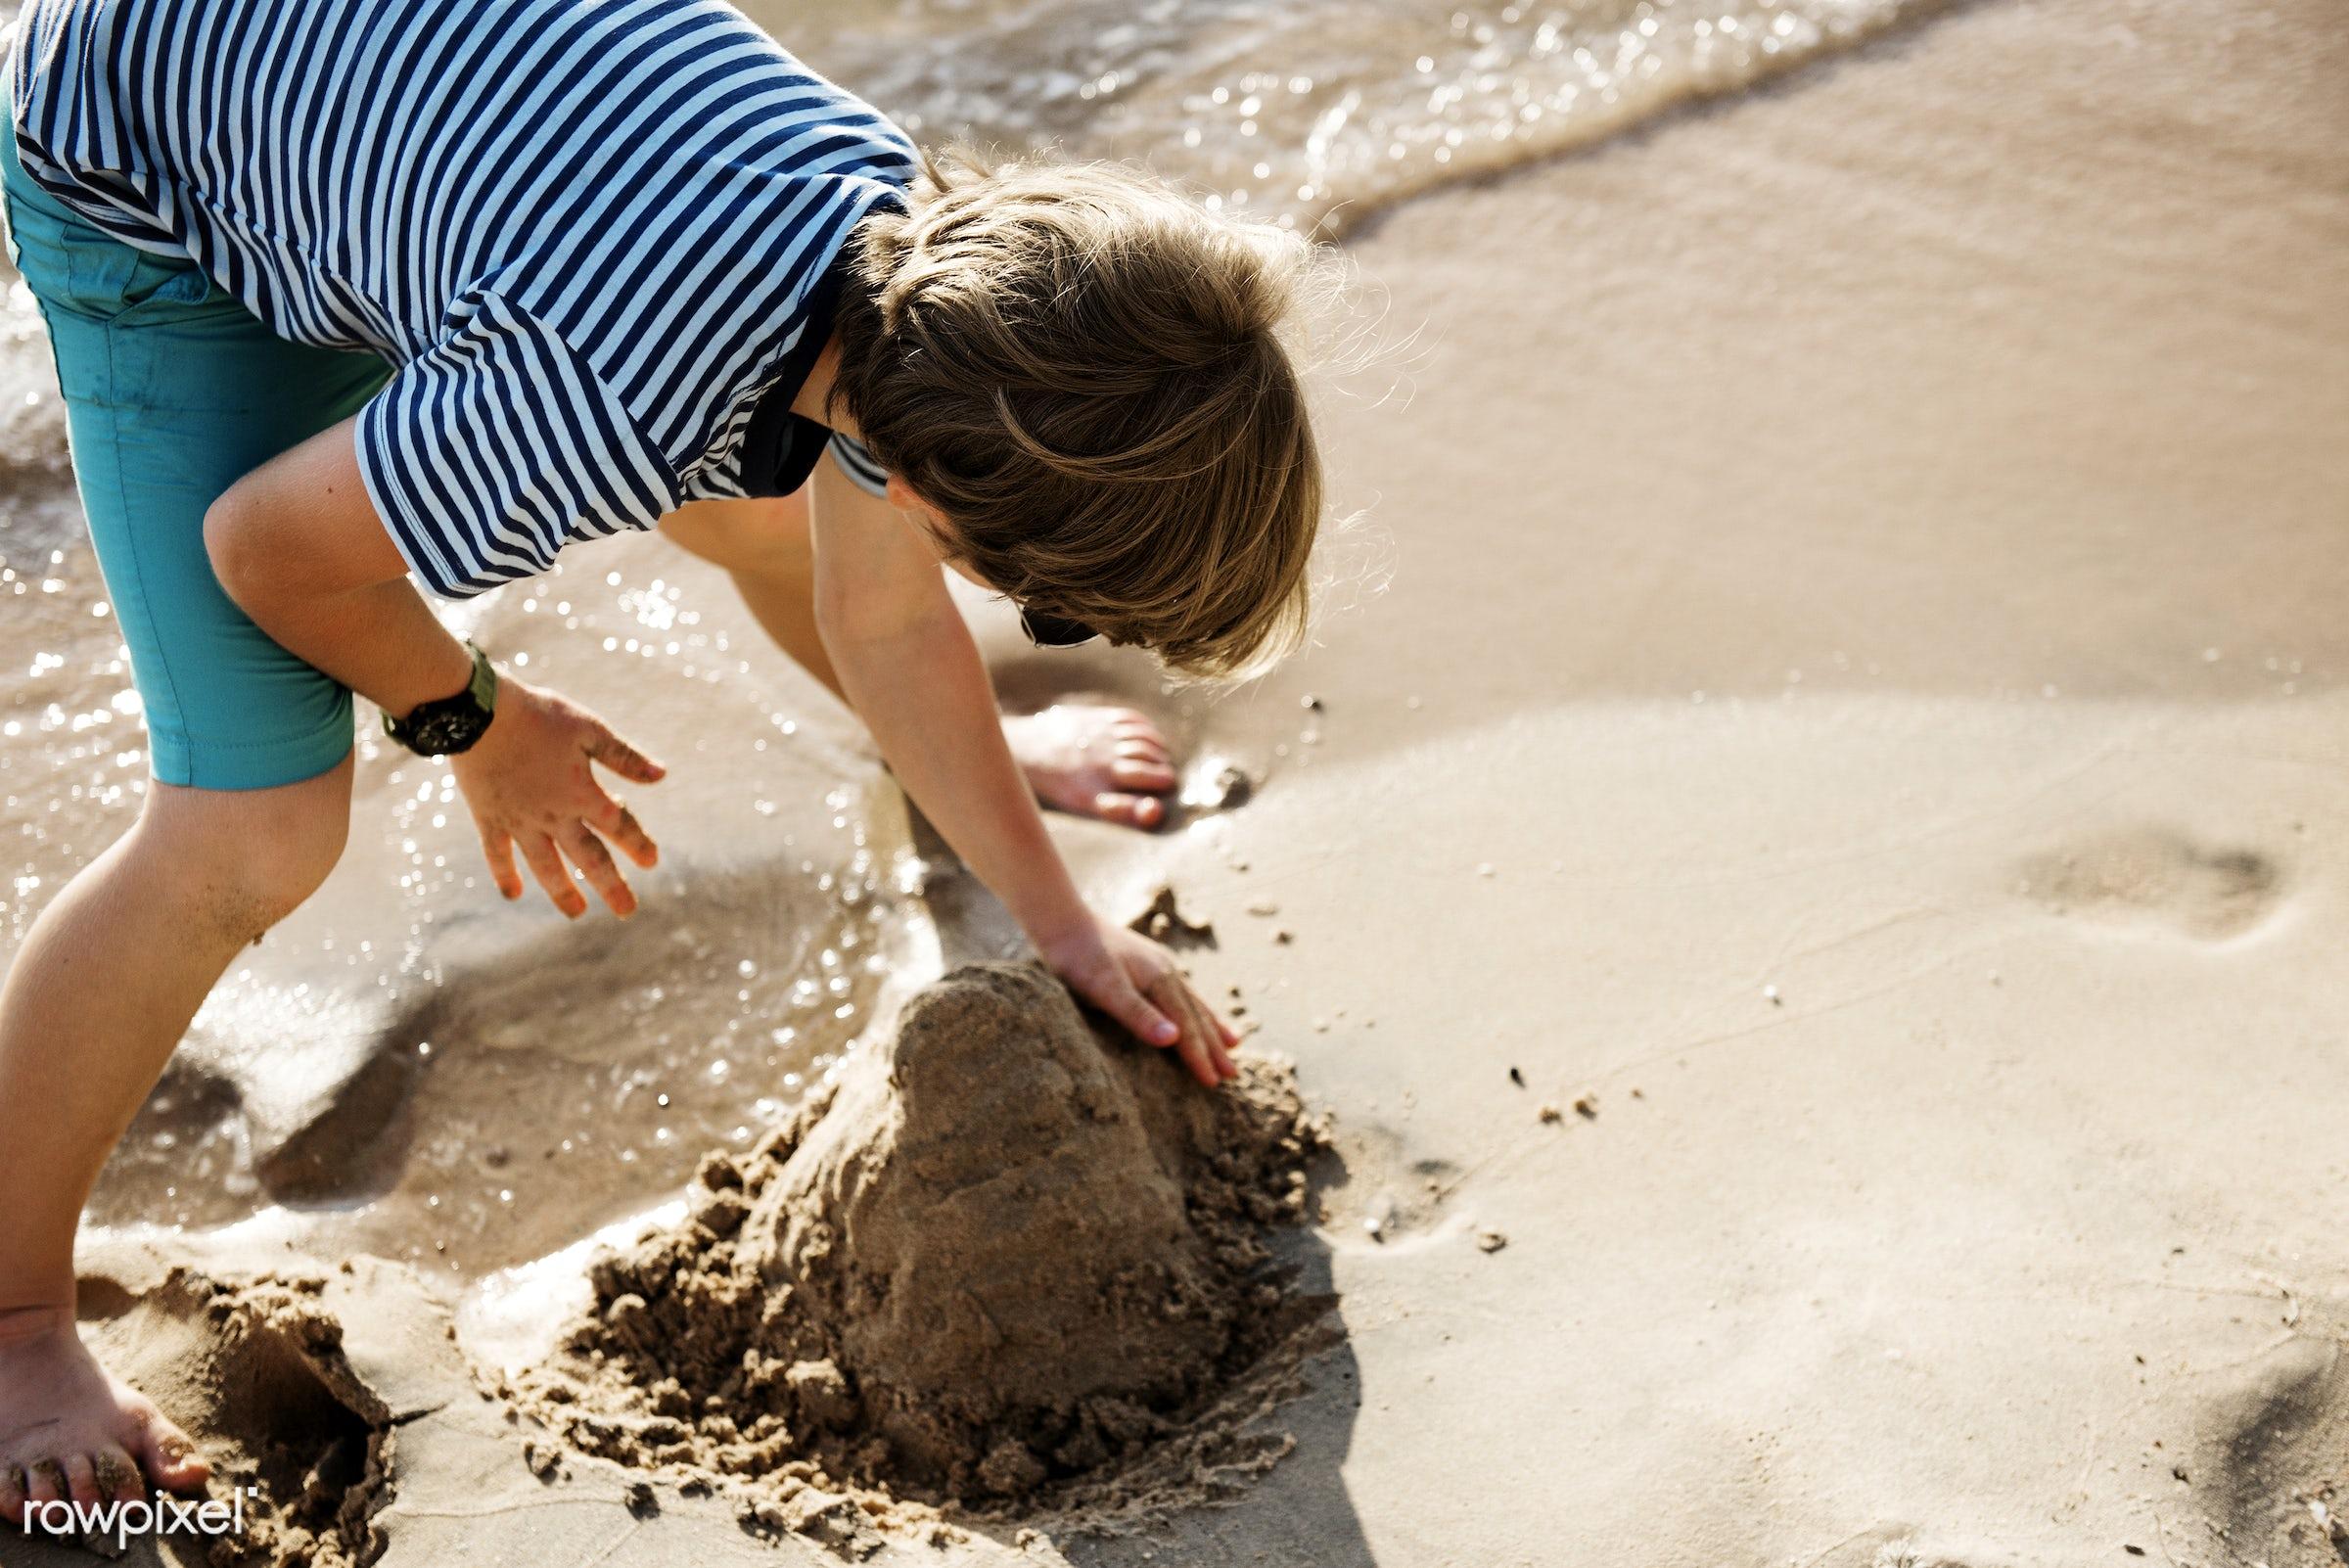 alone, beach, boy, cheerful, child, closeup, coast, enjoying, fun, happiness, holiday, kid, leisure, outdoors, playing,...